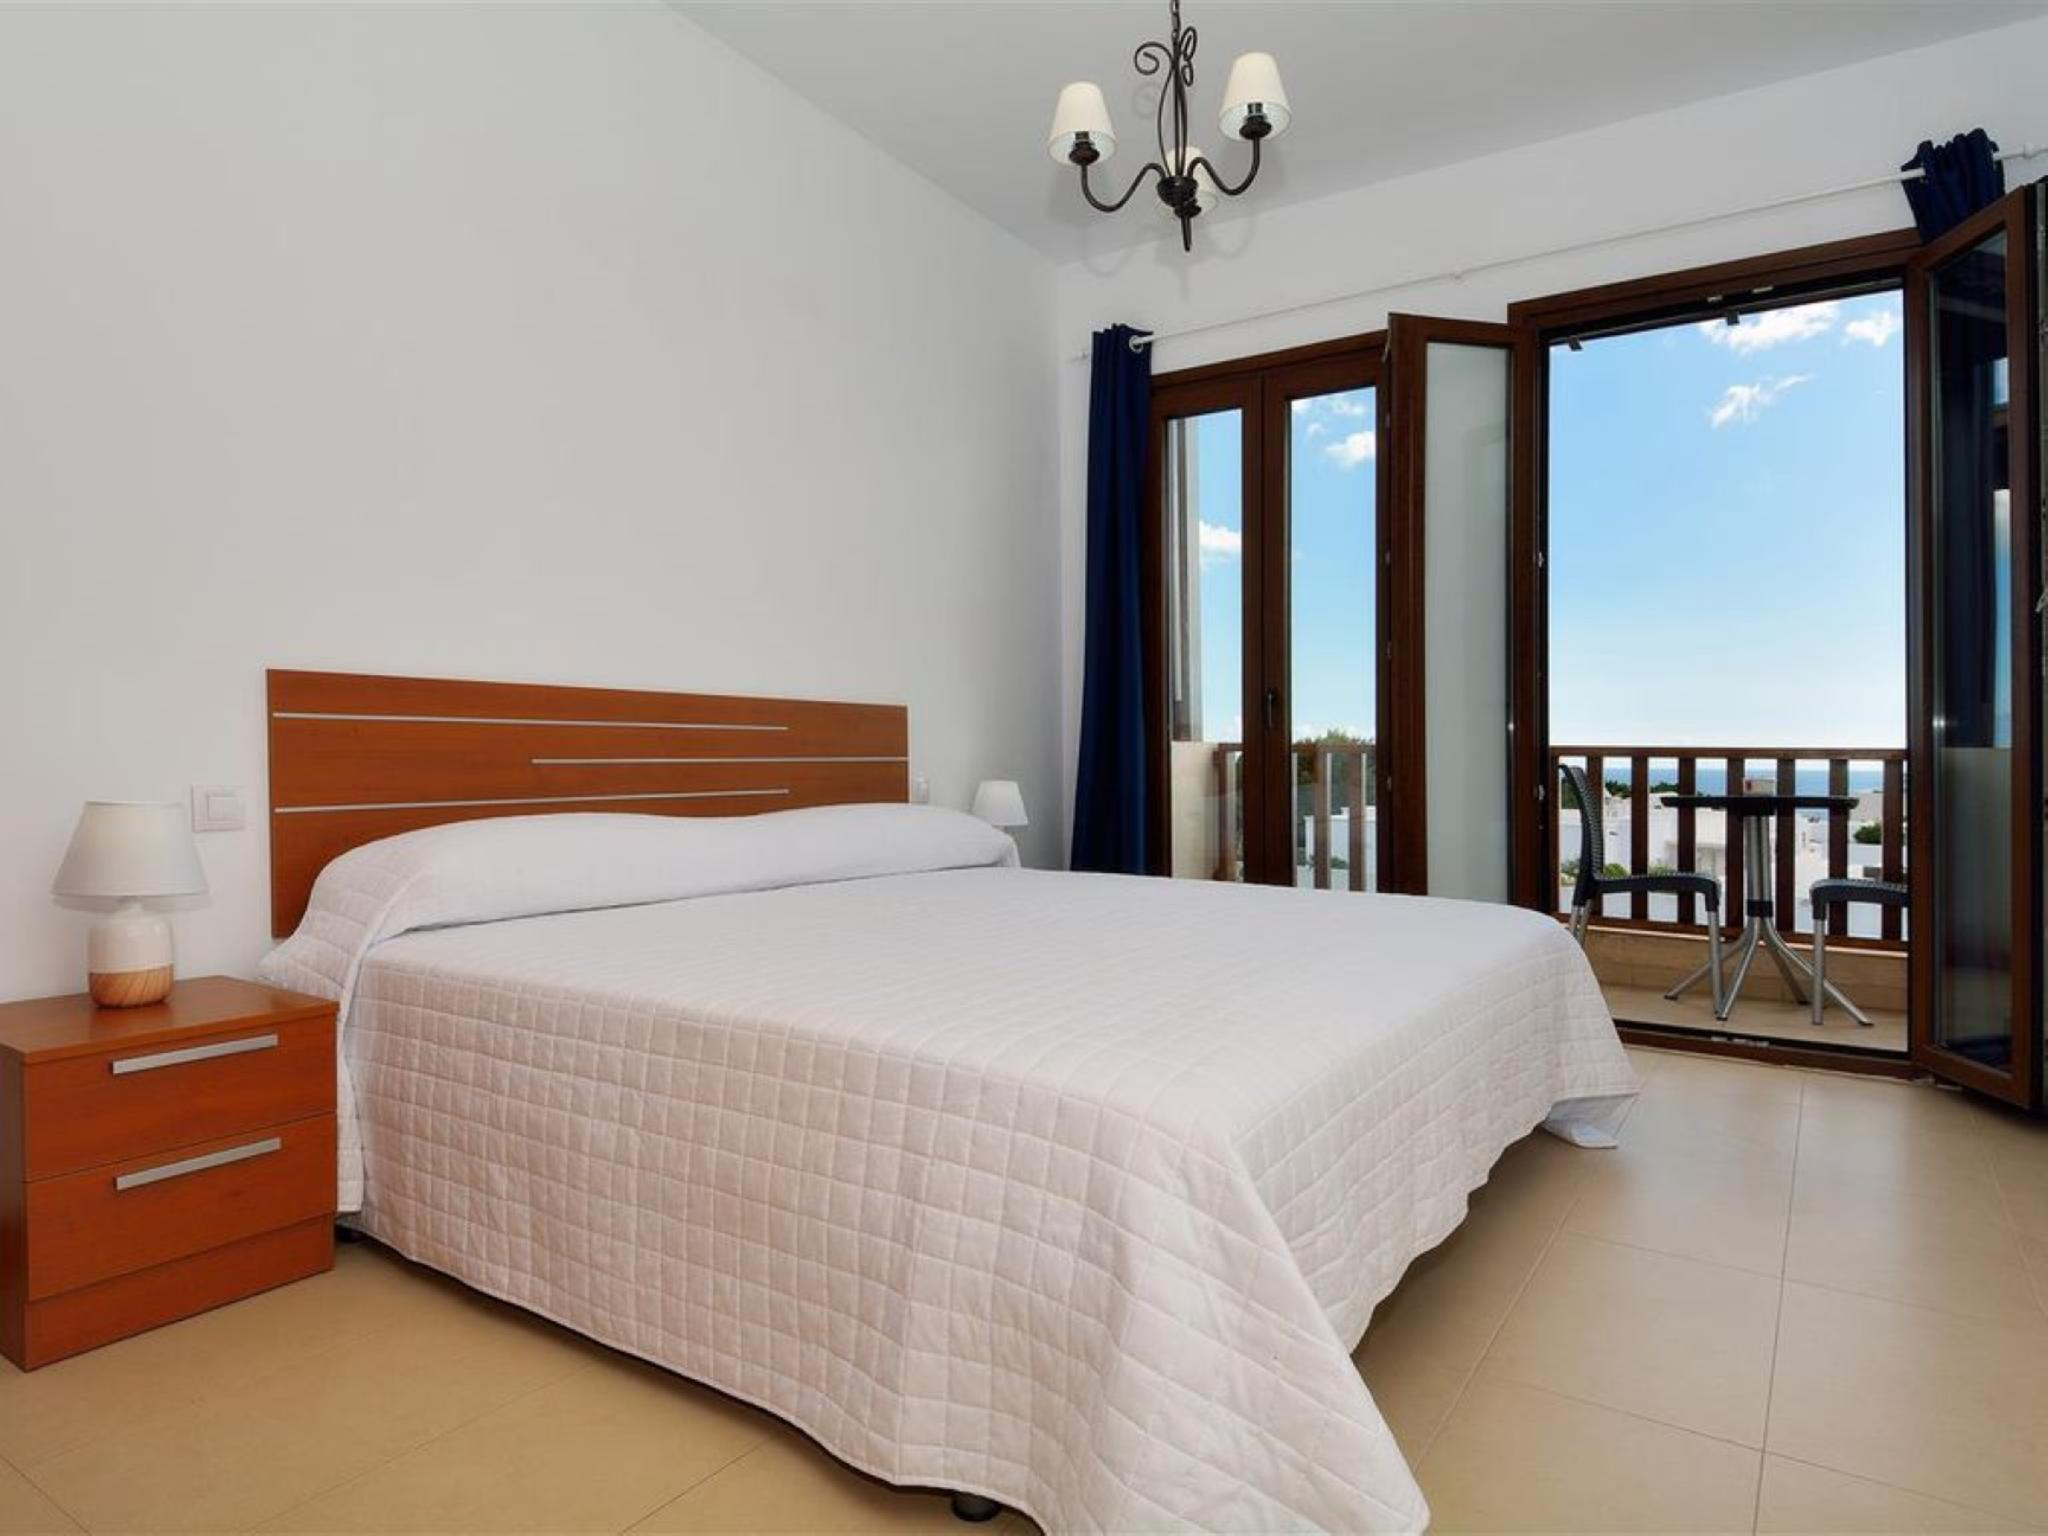 107485   House In Puerto Calero